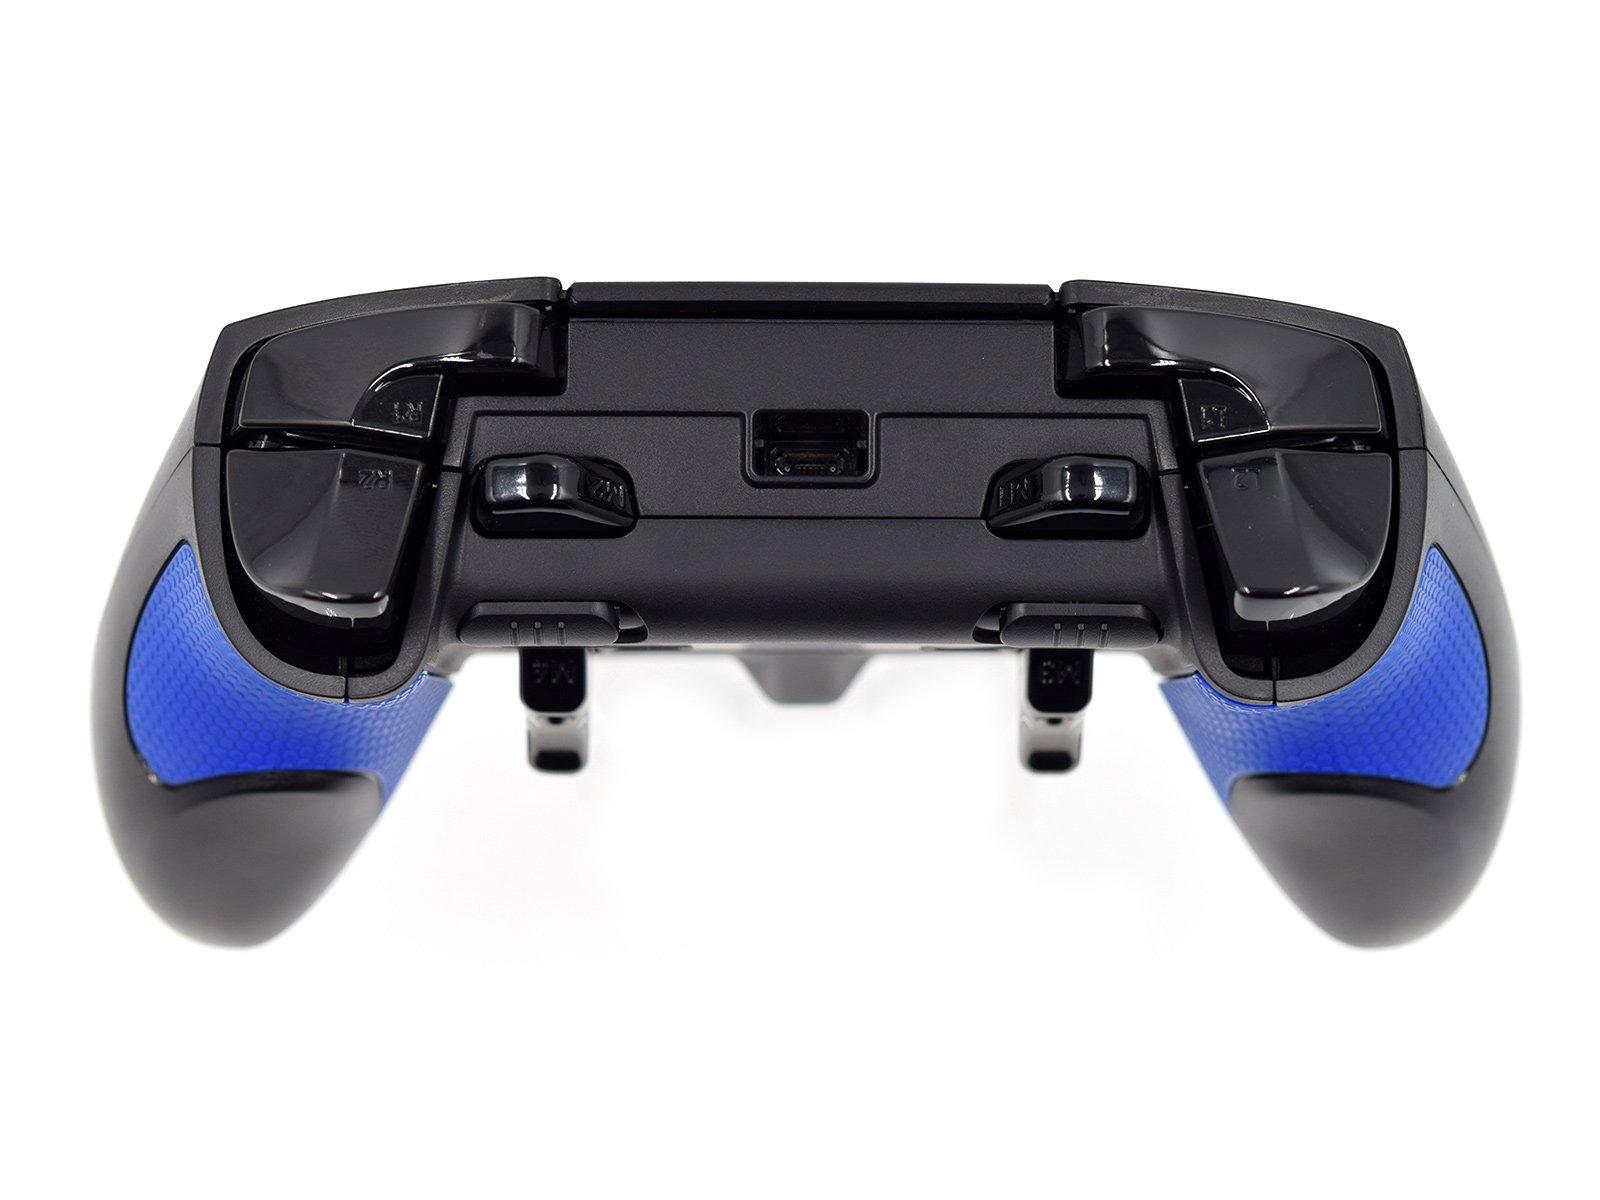 Razer Raiju Gaming Controller View 5